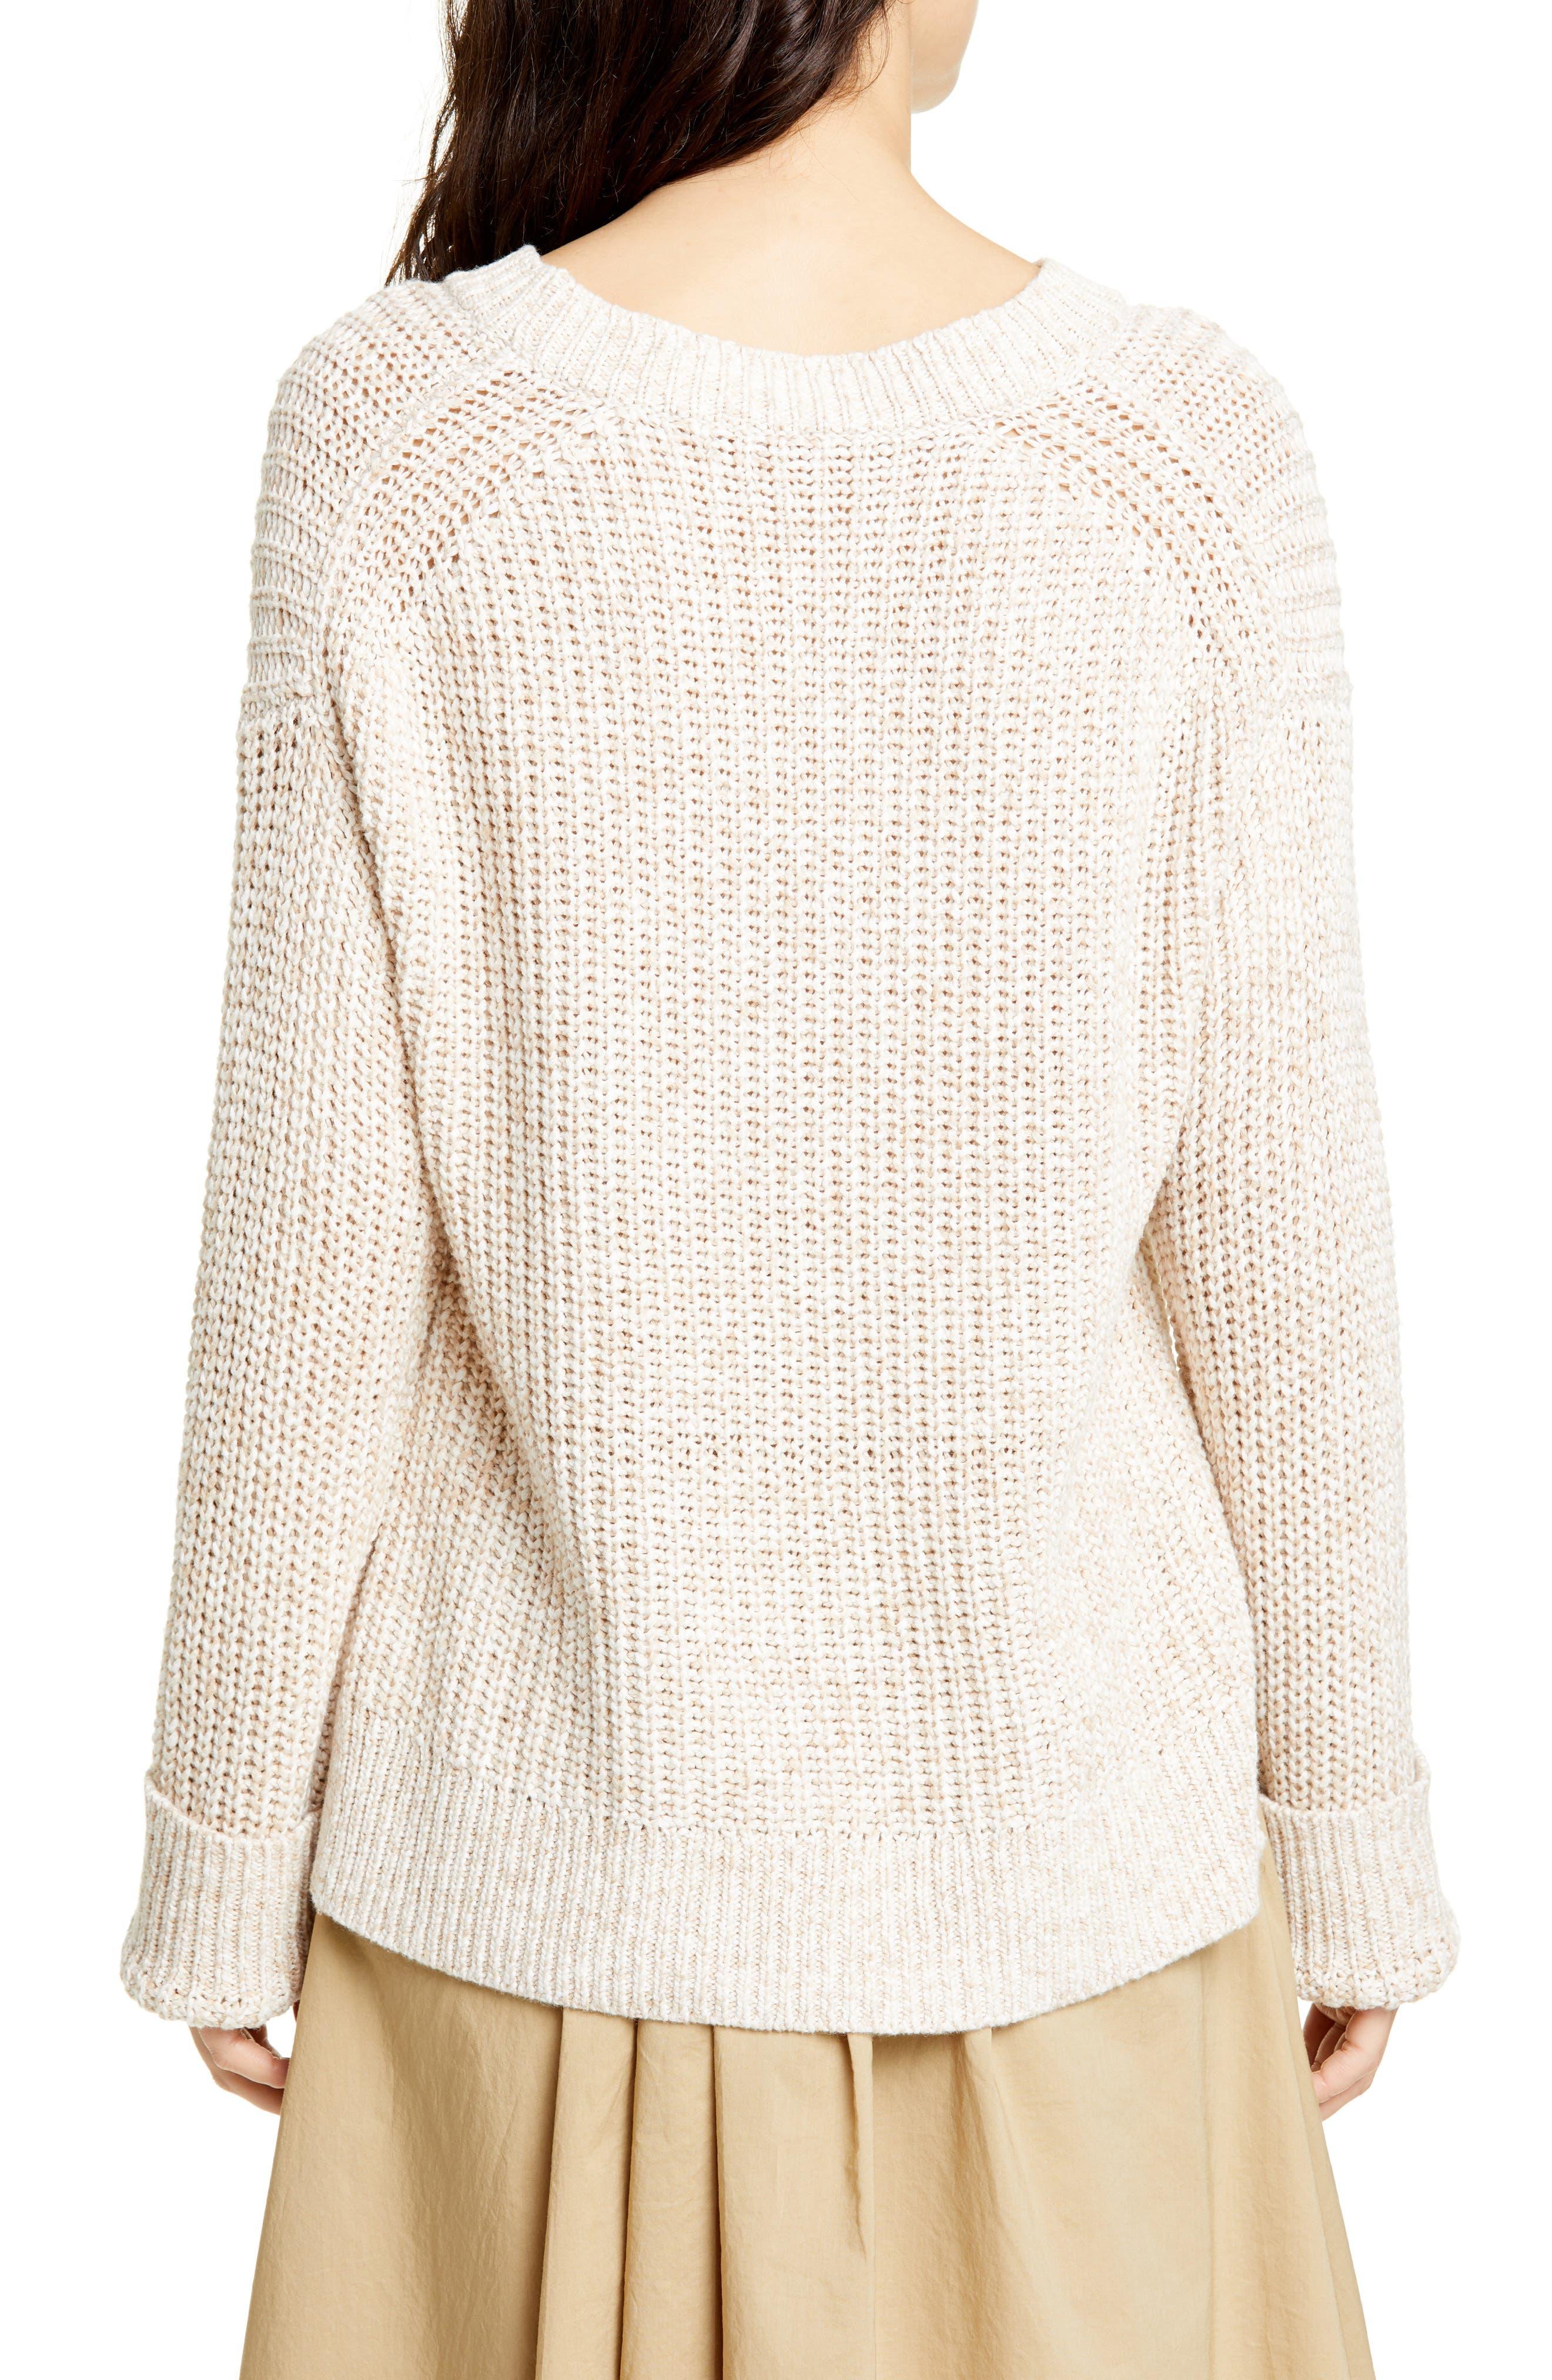 ALEX MILL, Mélange Sweater, Alternate thumbnail 2, color, LIGHT KHAKI